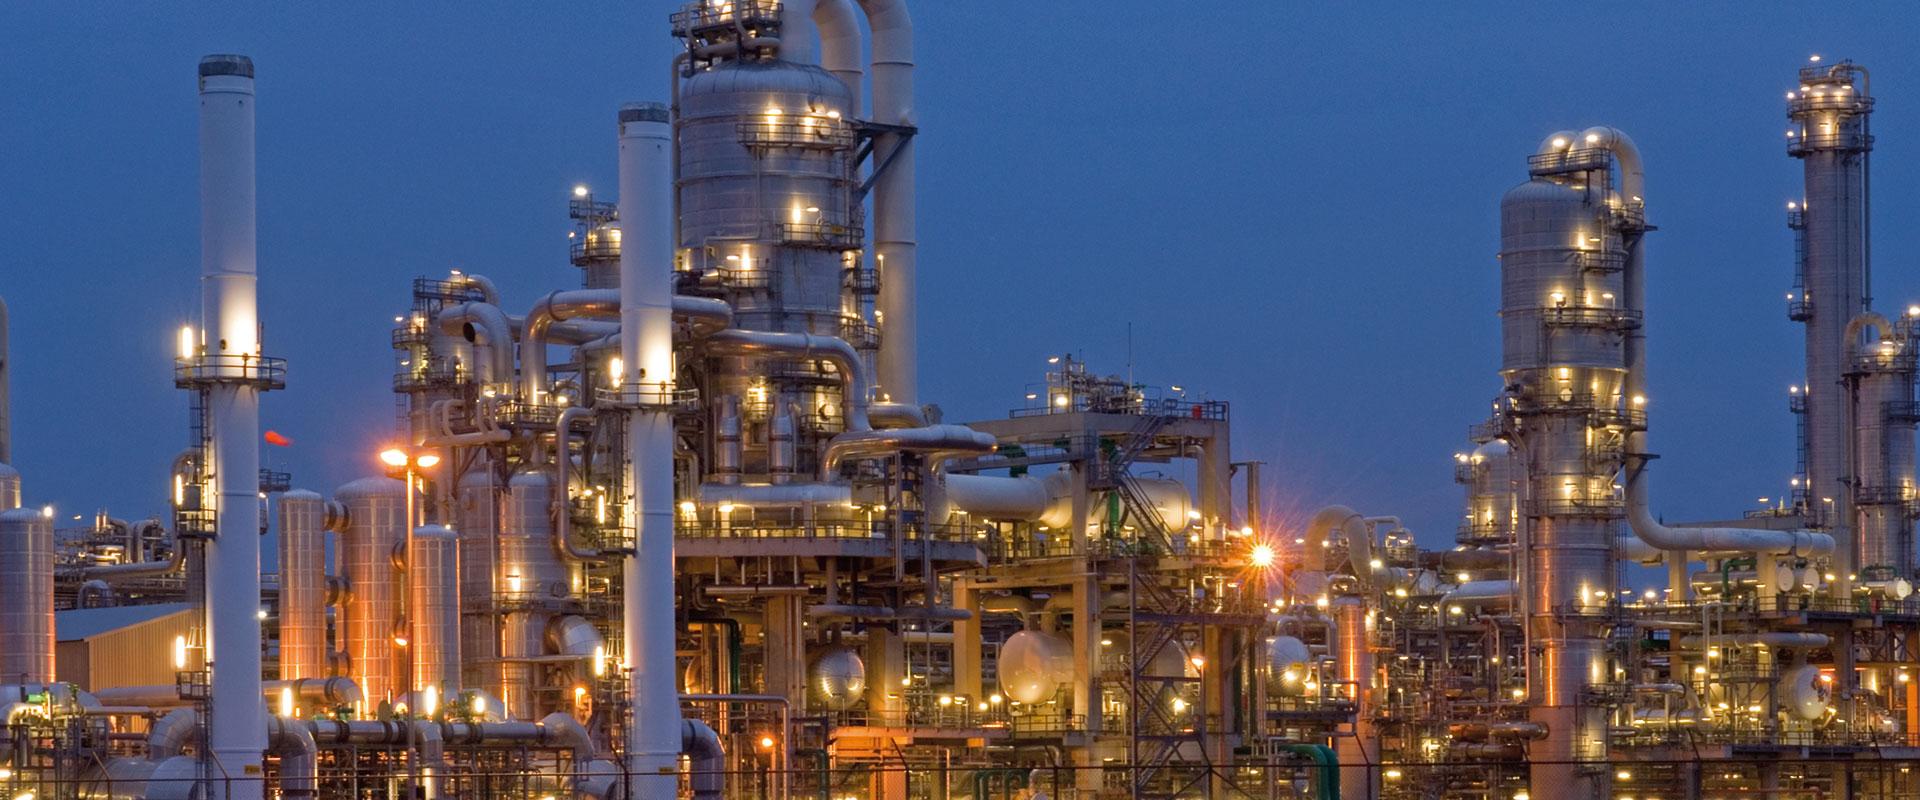 Открытка химического предприятия